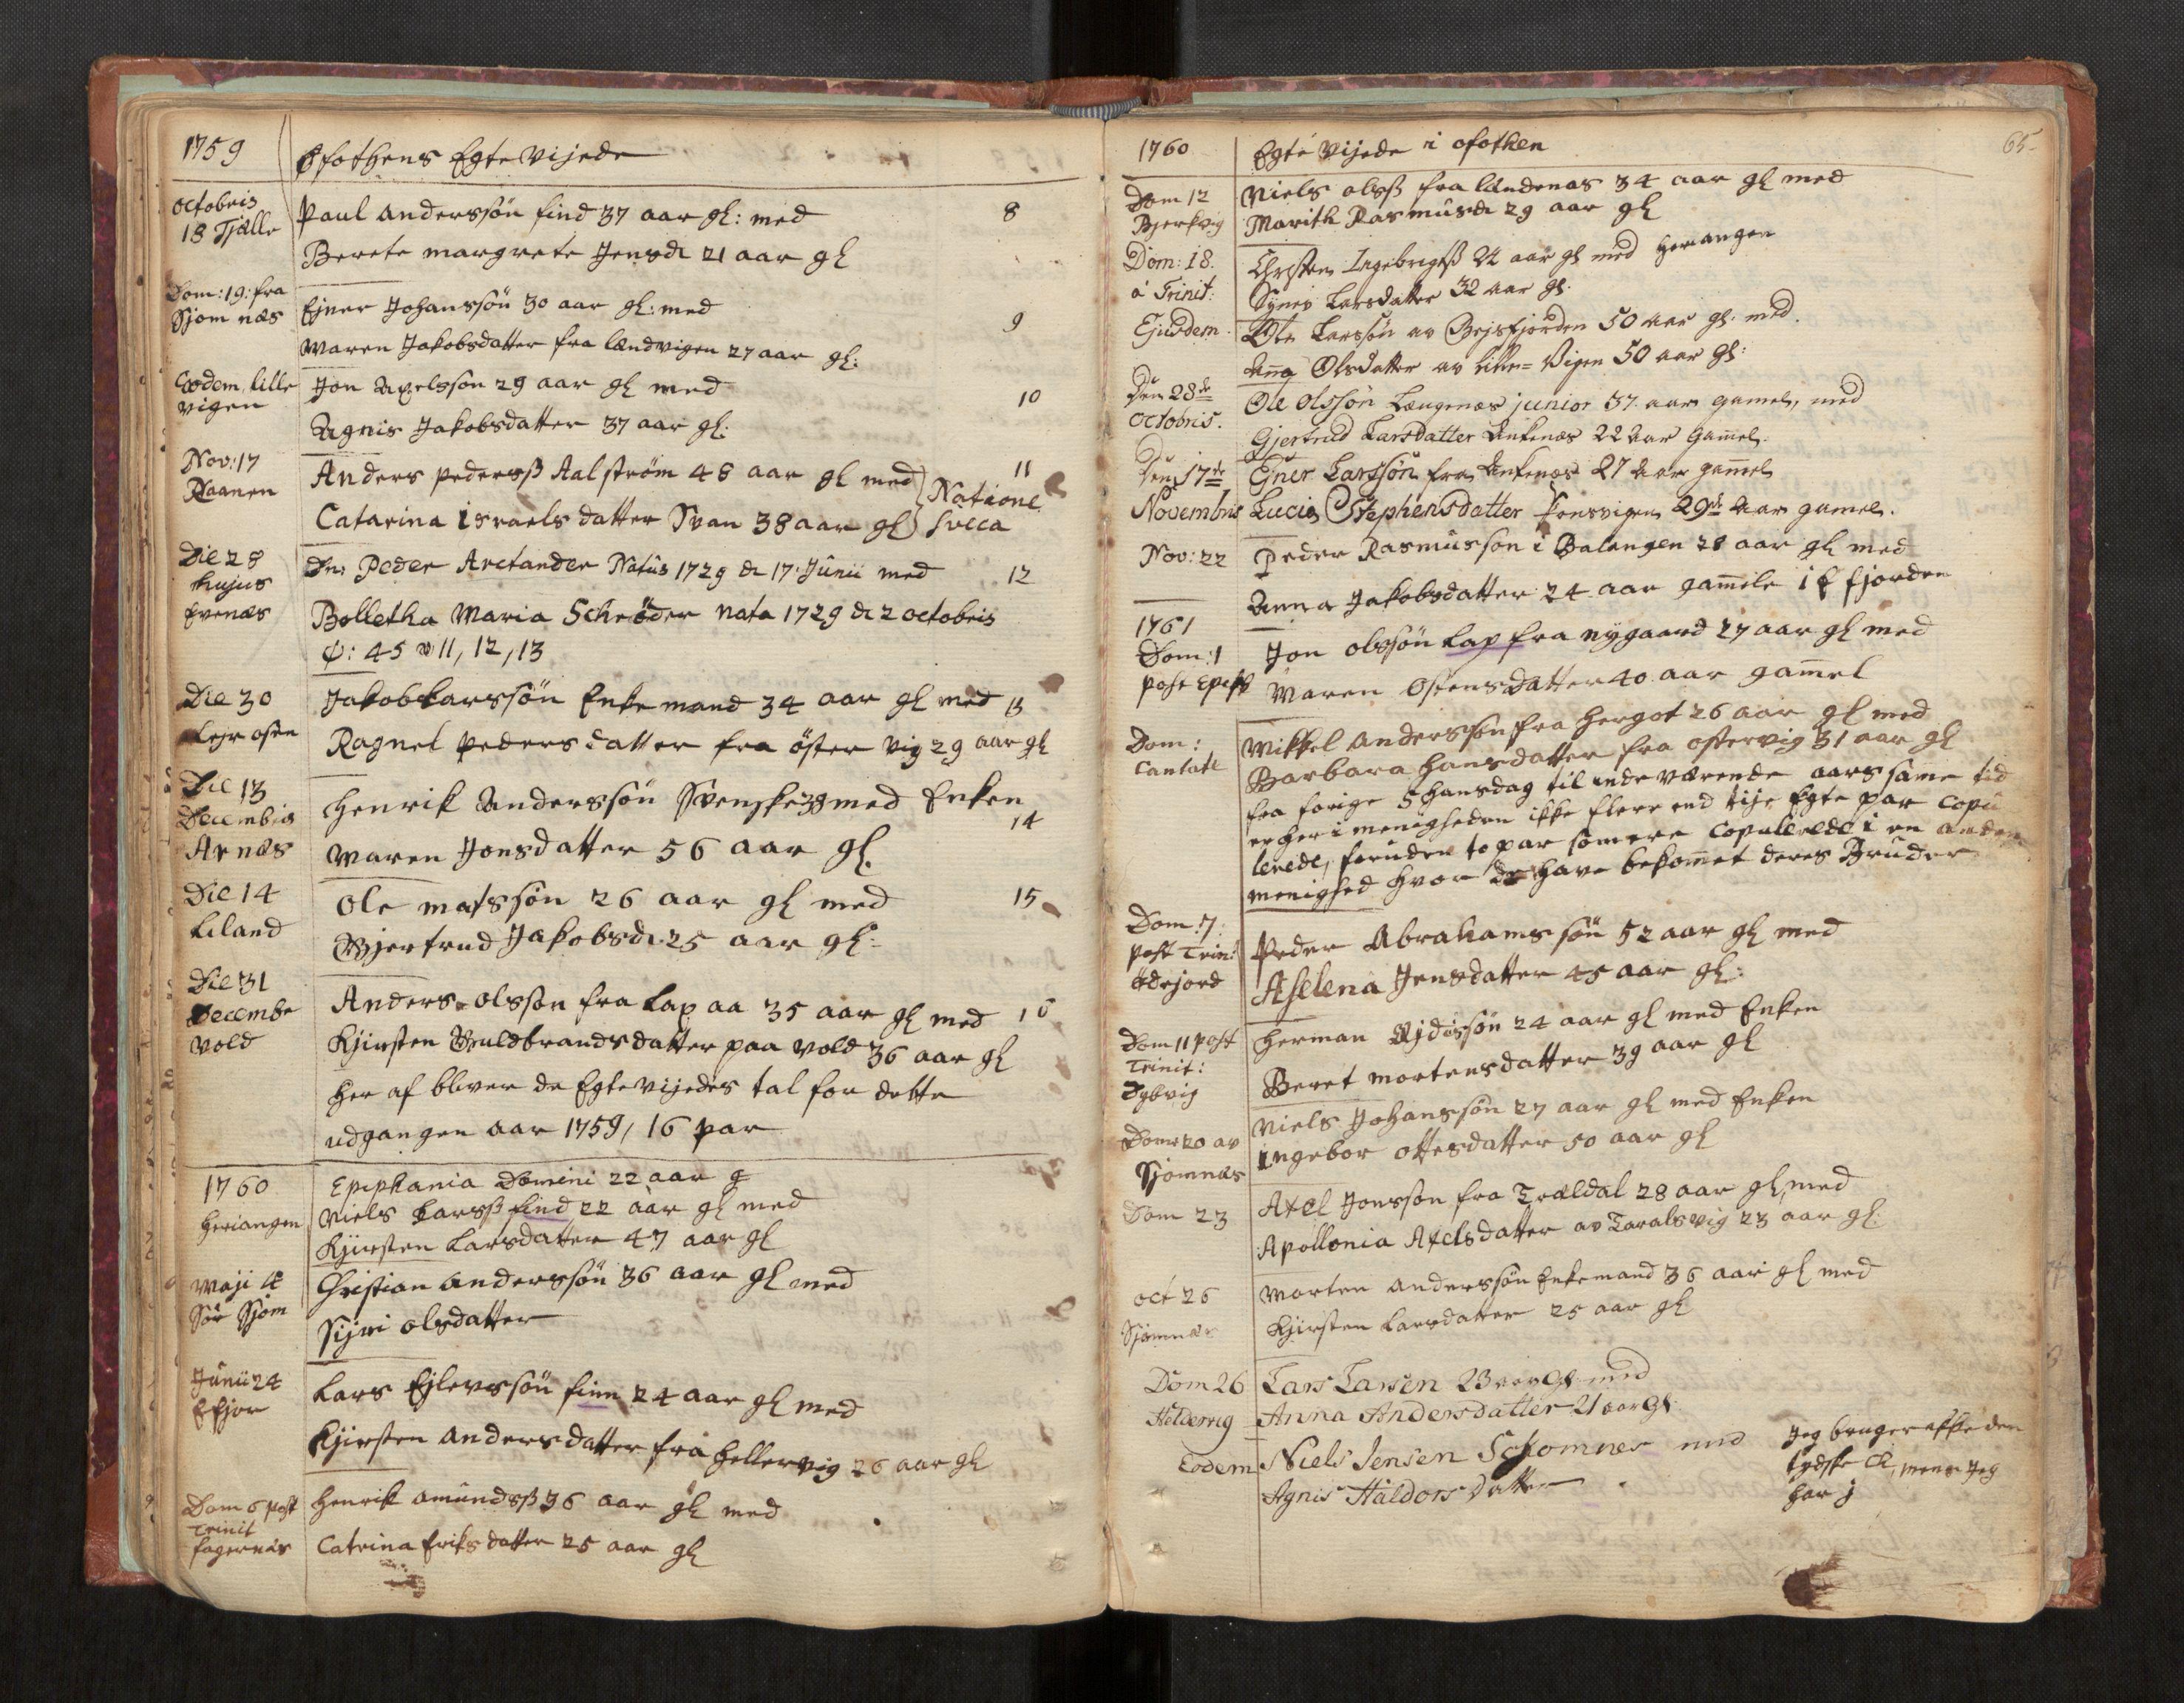 SAT, Ministerialprotokoller, klokkerbøker og fødselsregistre - Nordland, 863/L0891: Ministerialbok nr. 863A03, 1748-1764, s. 65